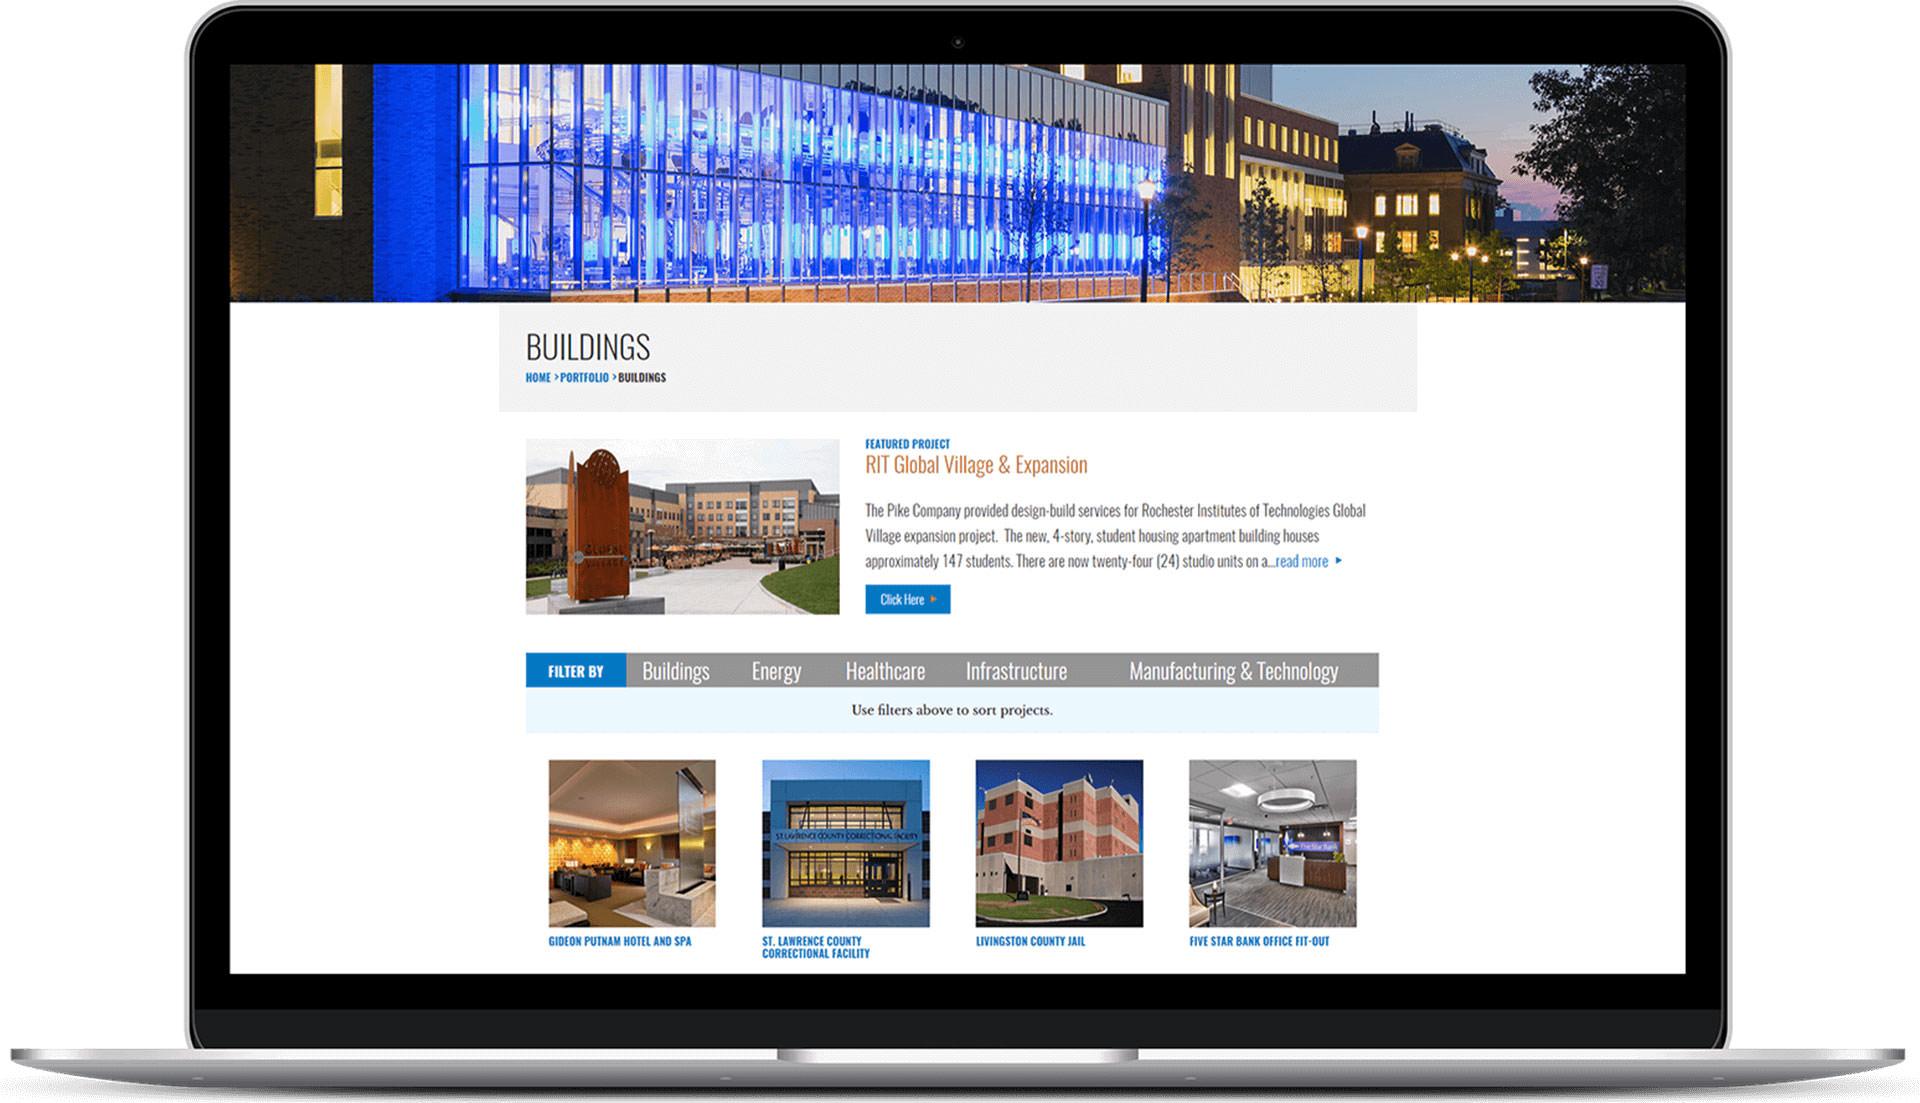 Pike Company Buildings portfolio page displayed on laptop